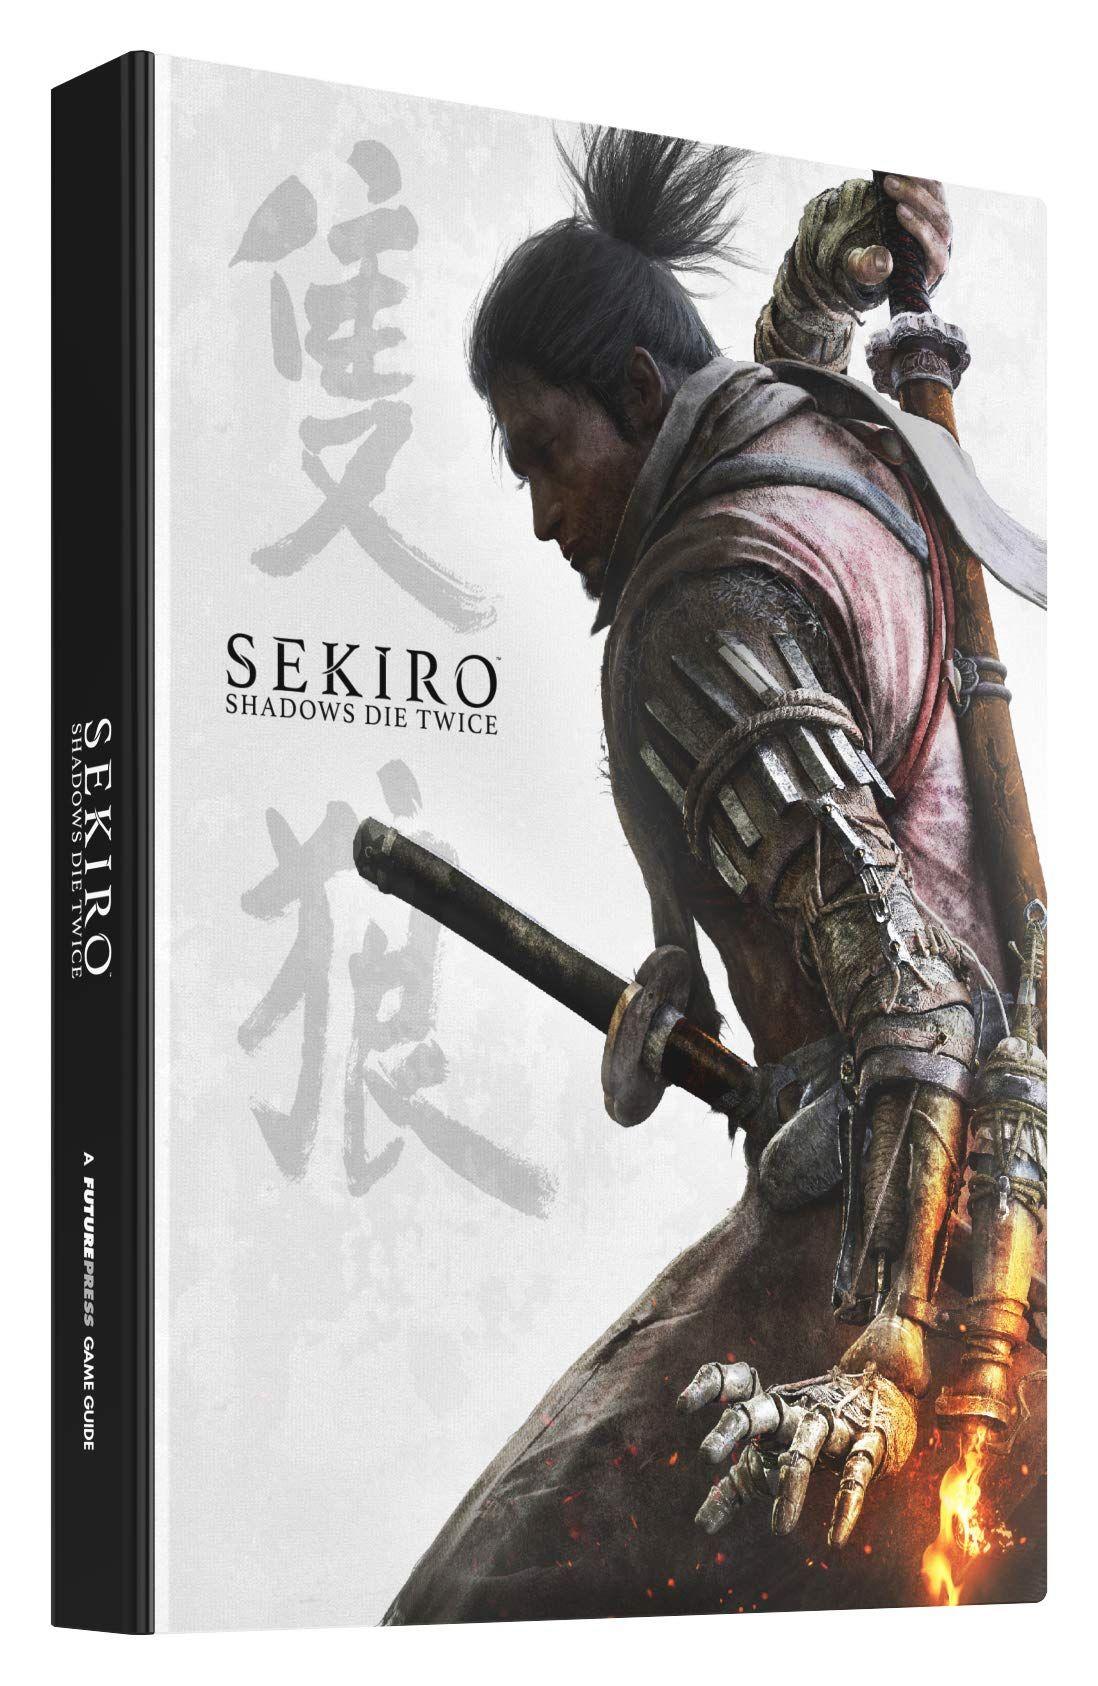 Guide officiel Sekiro Shadows die twice (import)